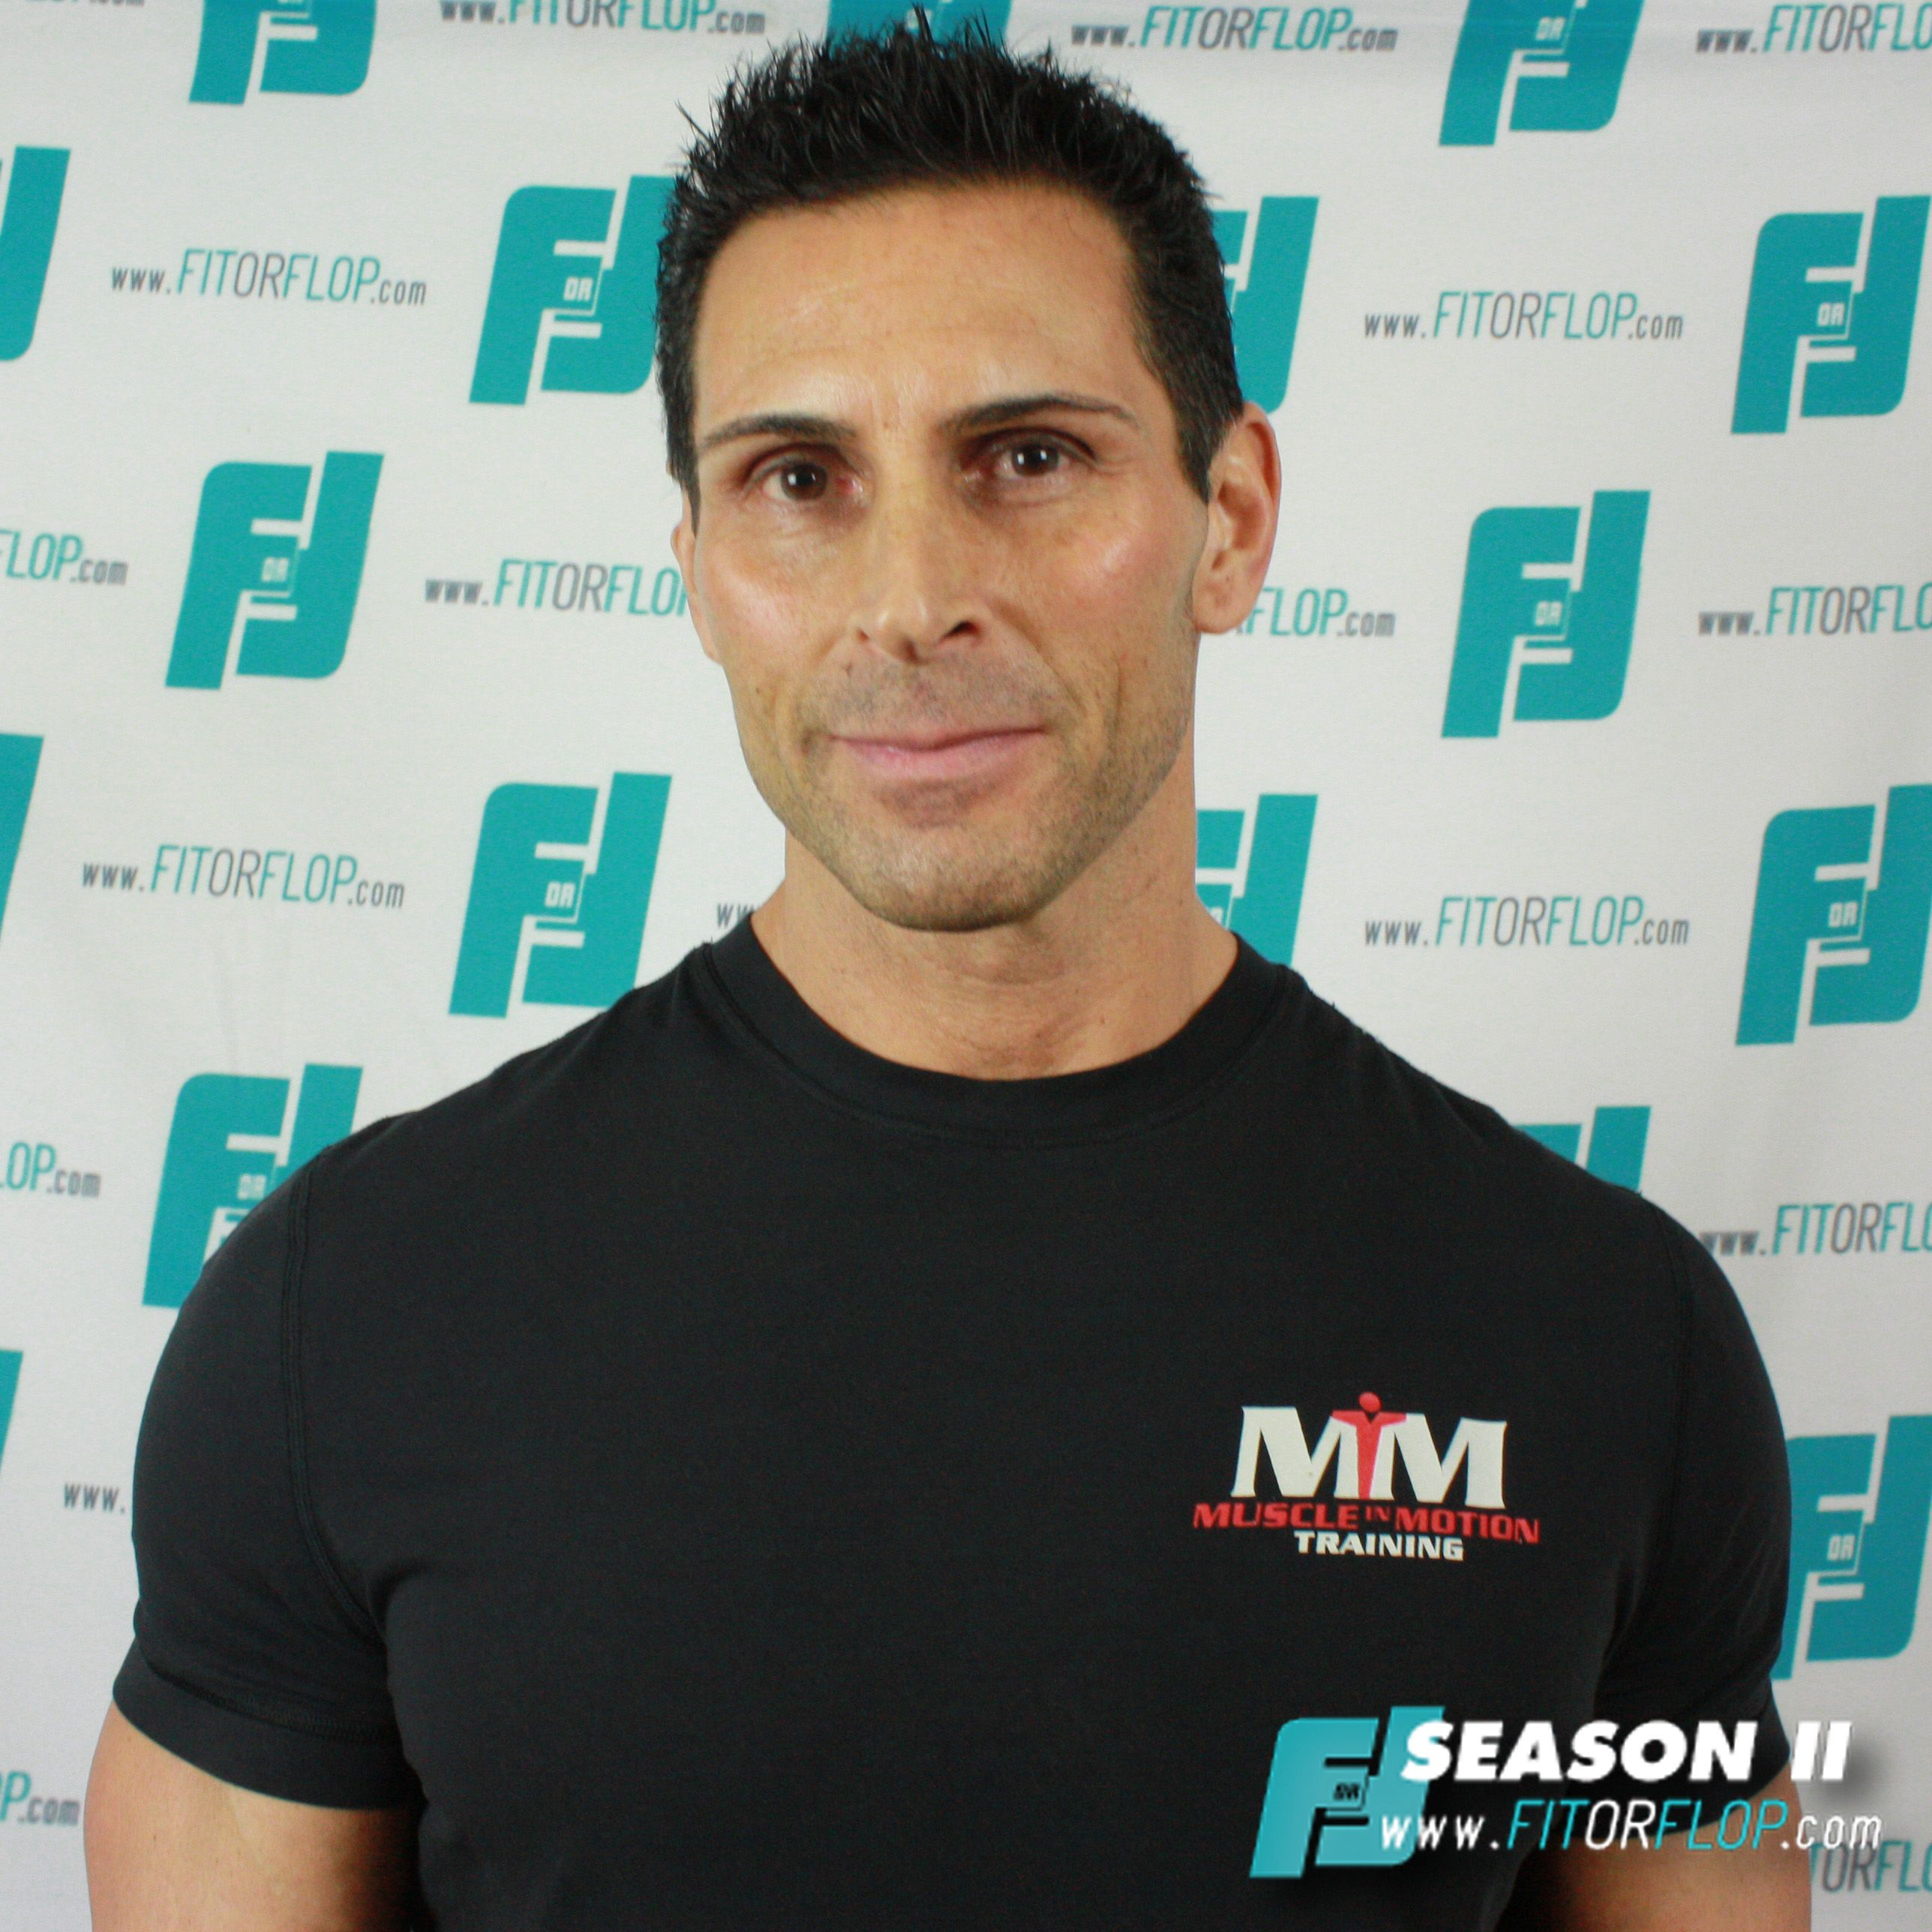 Contestant Gino Caccavale Seasons Season 2 Train